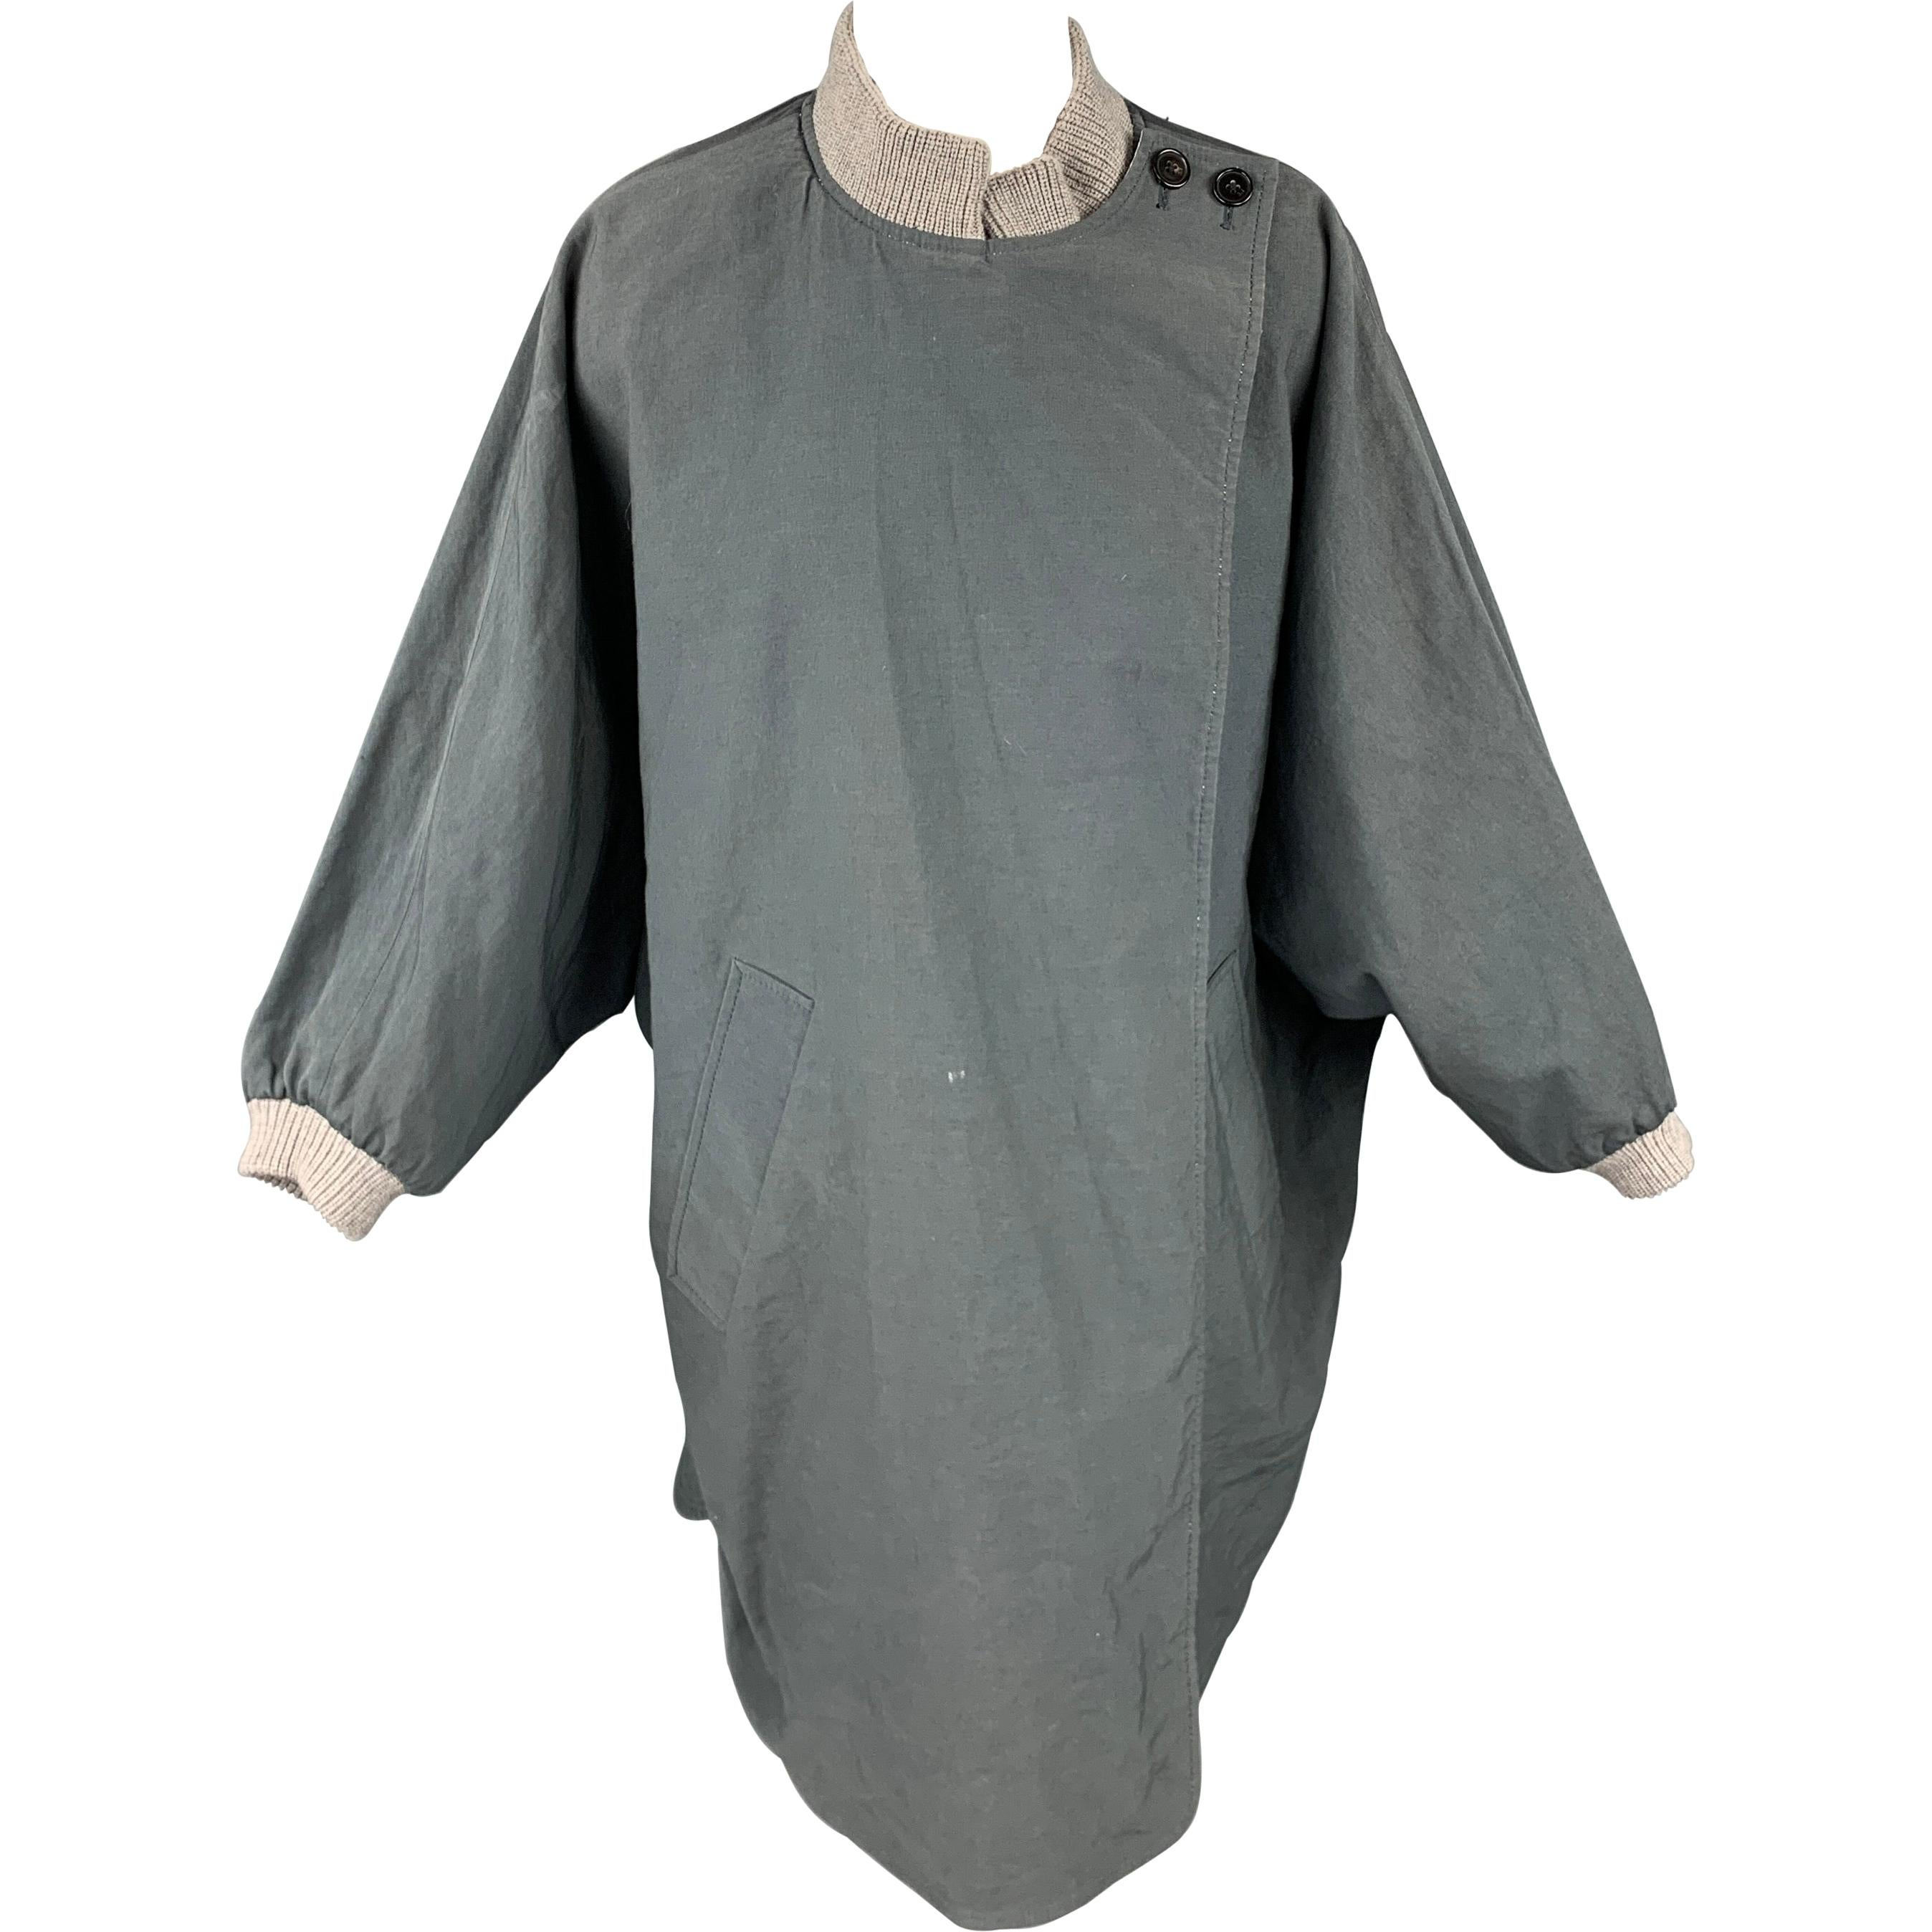 3.1 PHILLIP LIM Size M Gray & Beige Cotton Blend Oversized Reversible Jacket